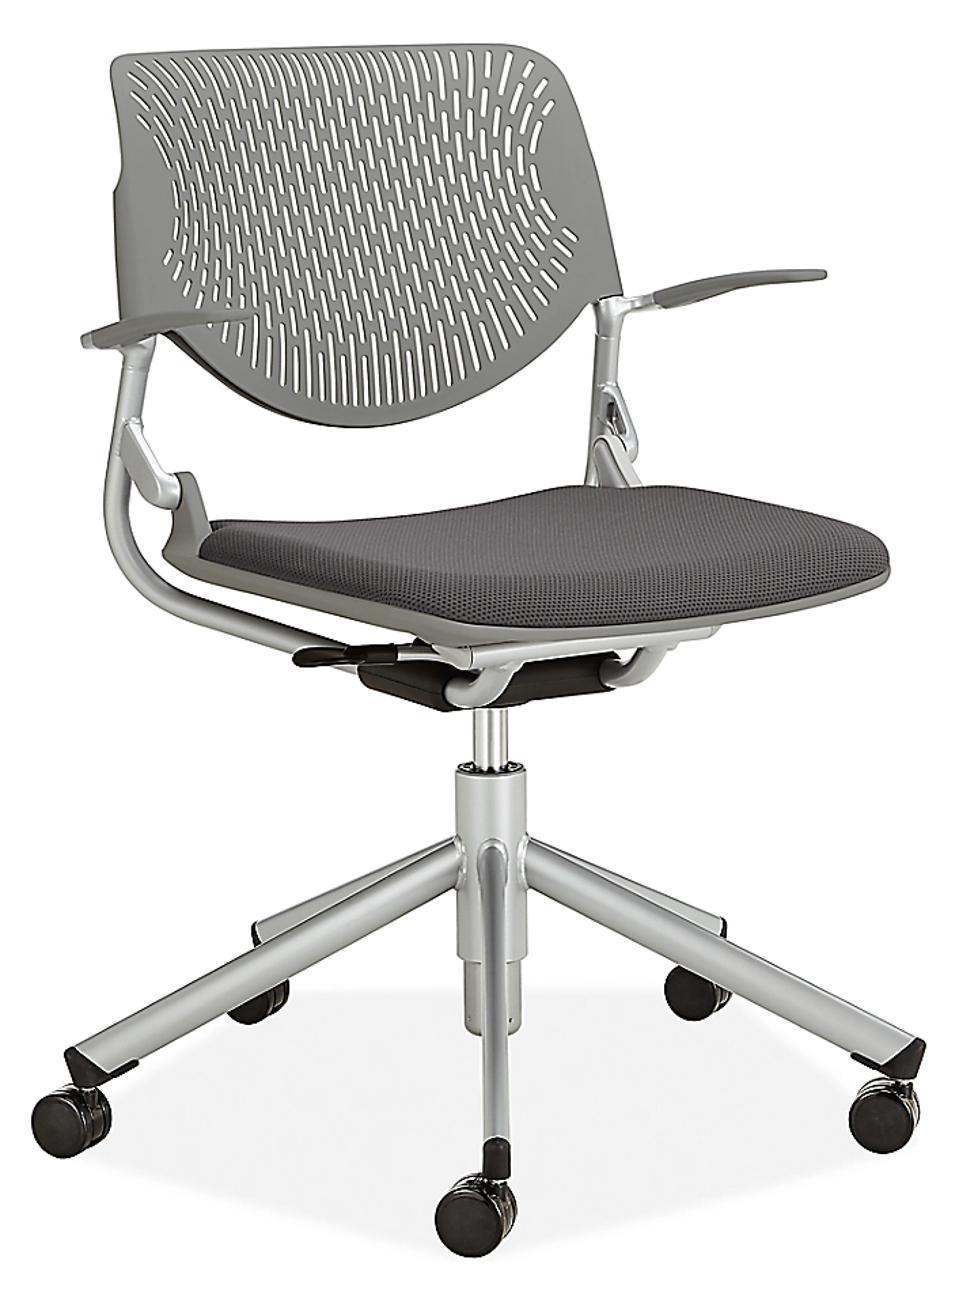 Runa Swivel Office Chair